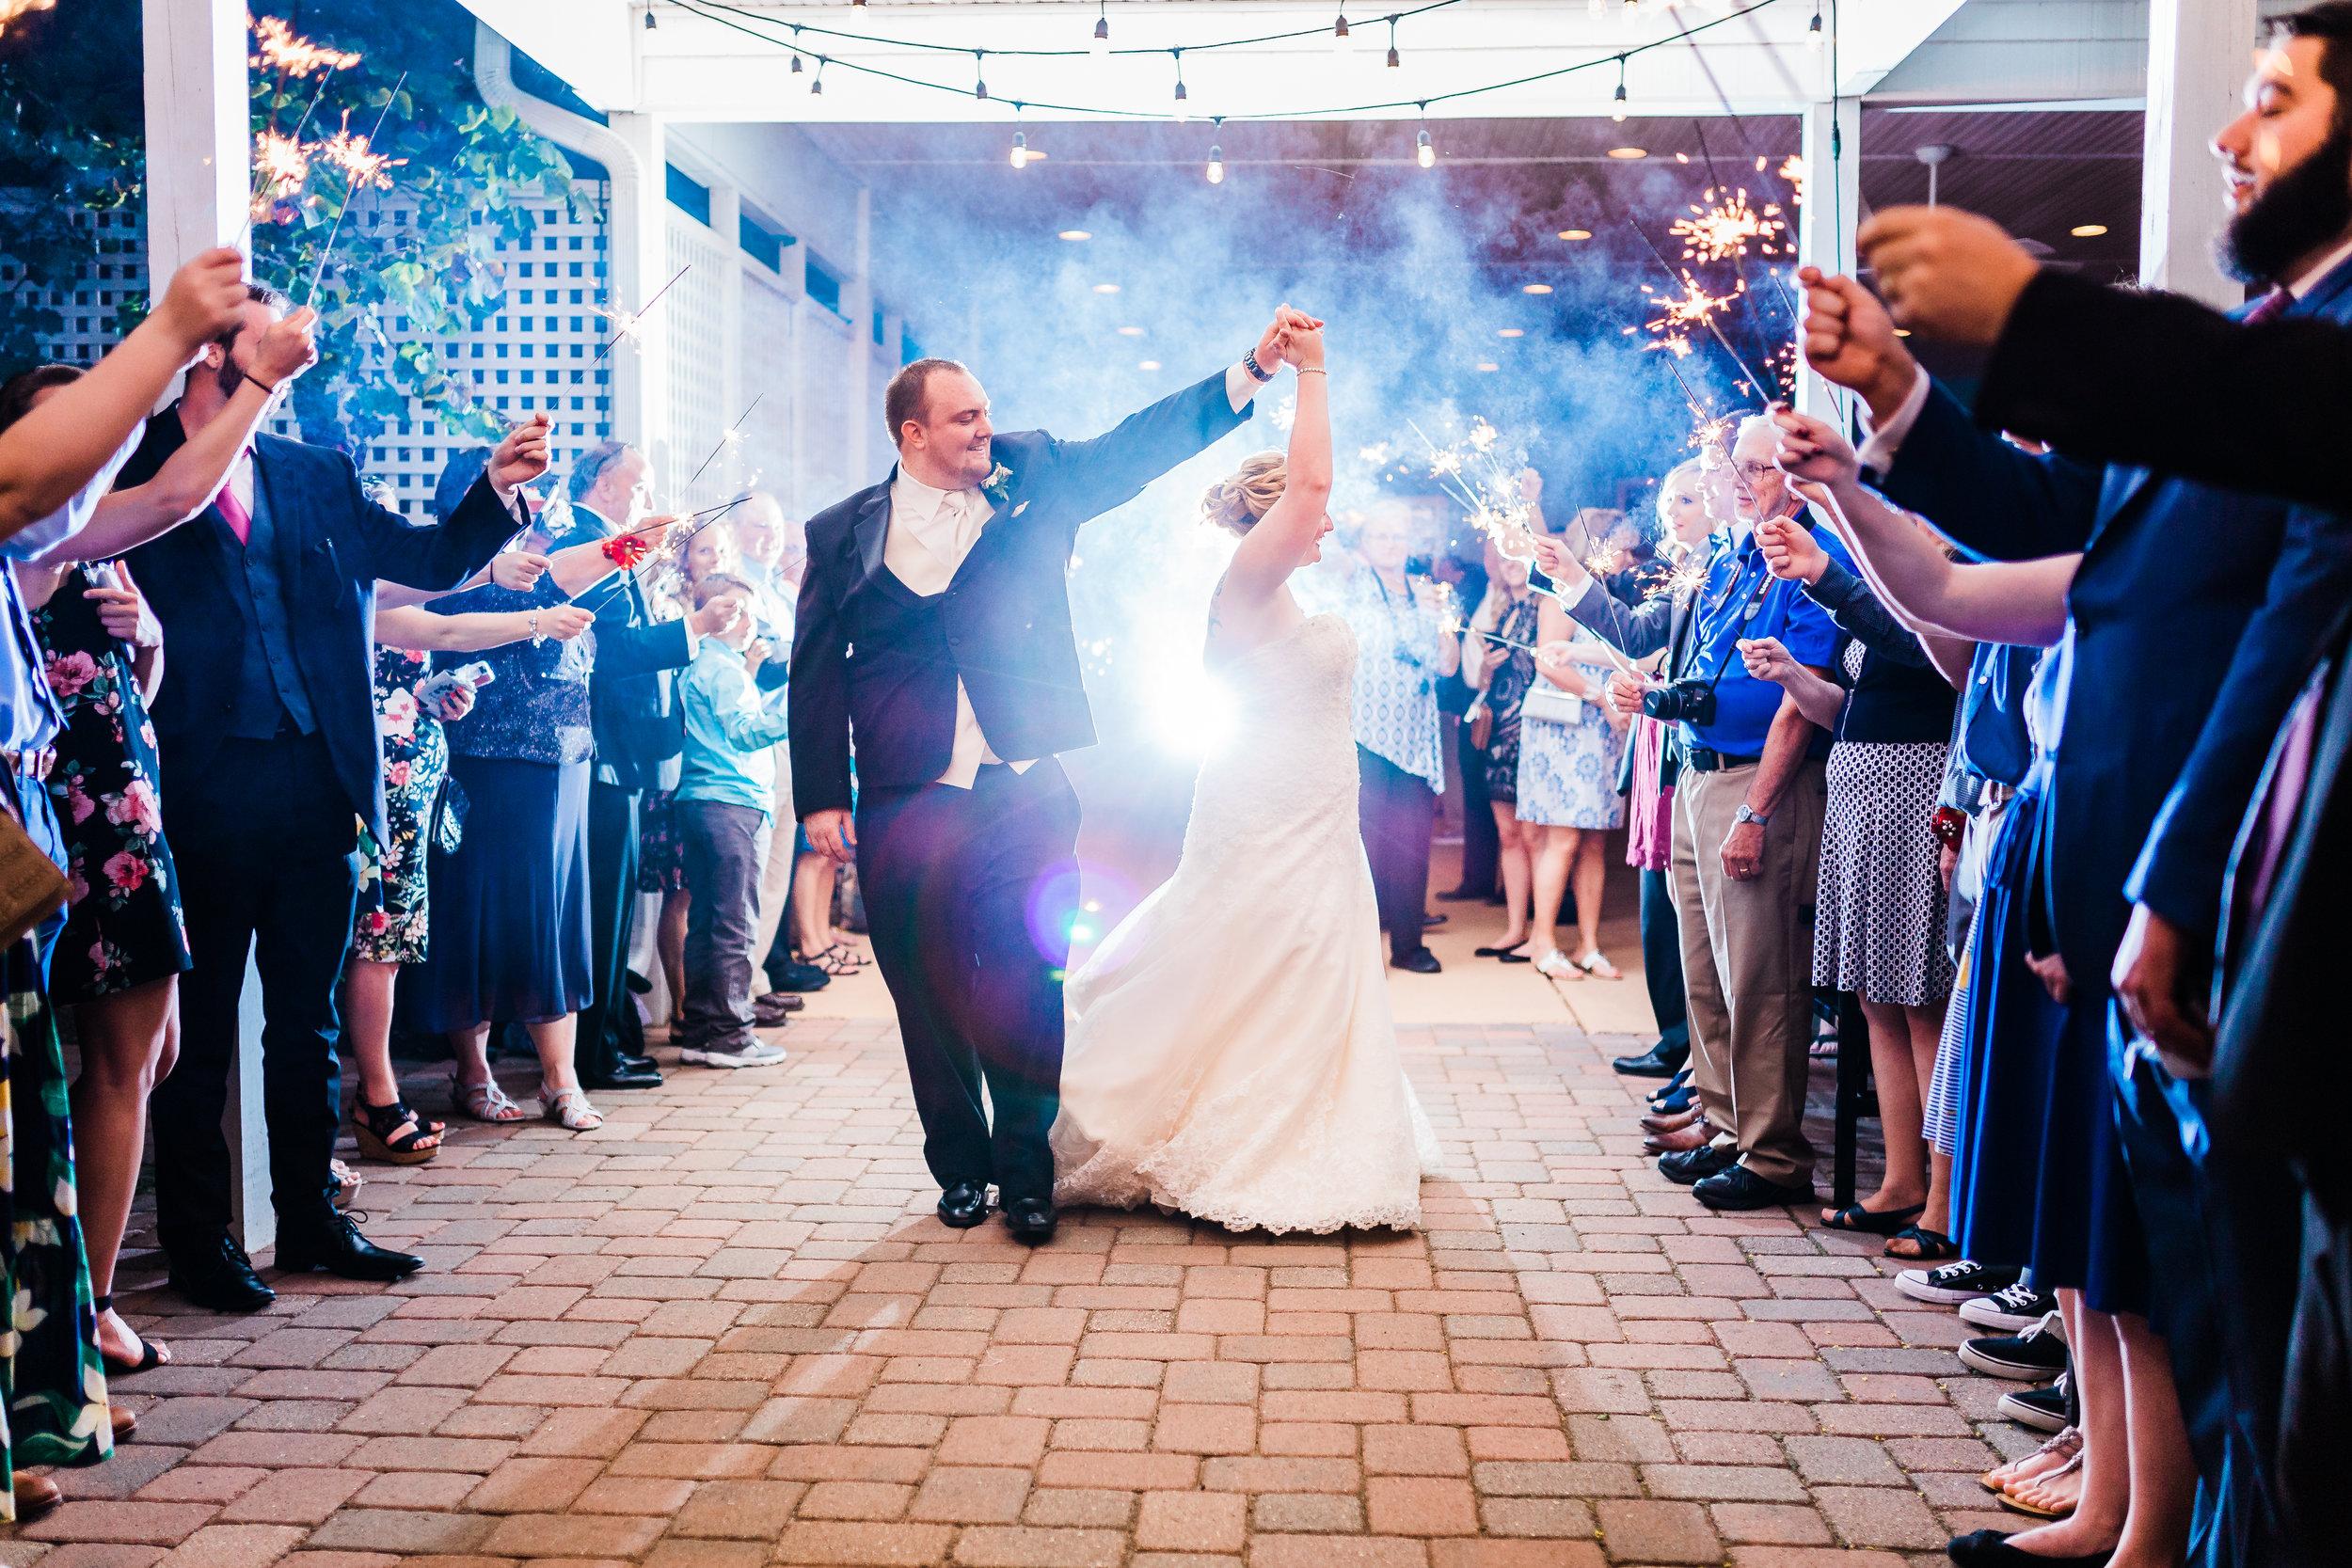 sparkler exit from maryland wedding - sparkler exit ideas - sparkler exit photography - maryland wedding photographer